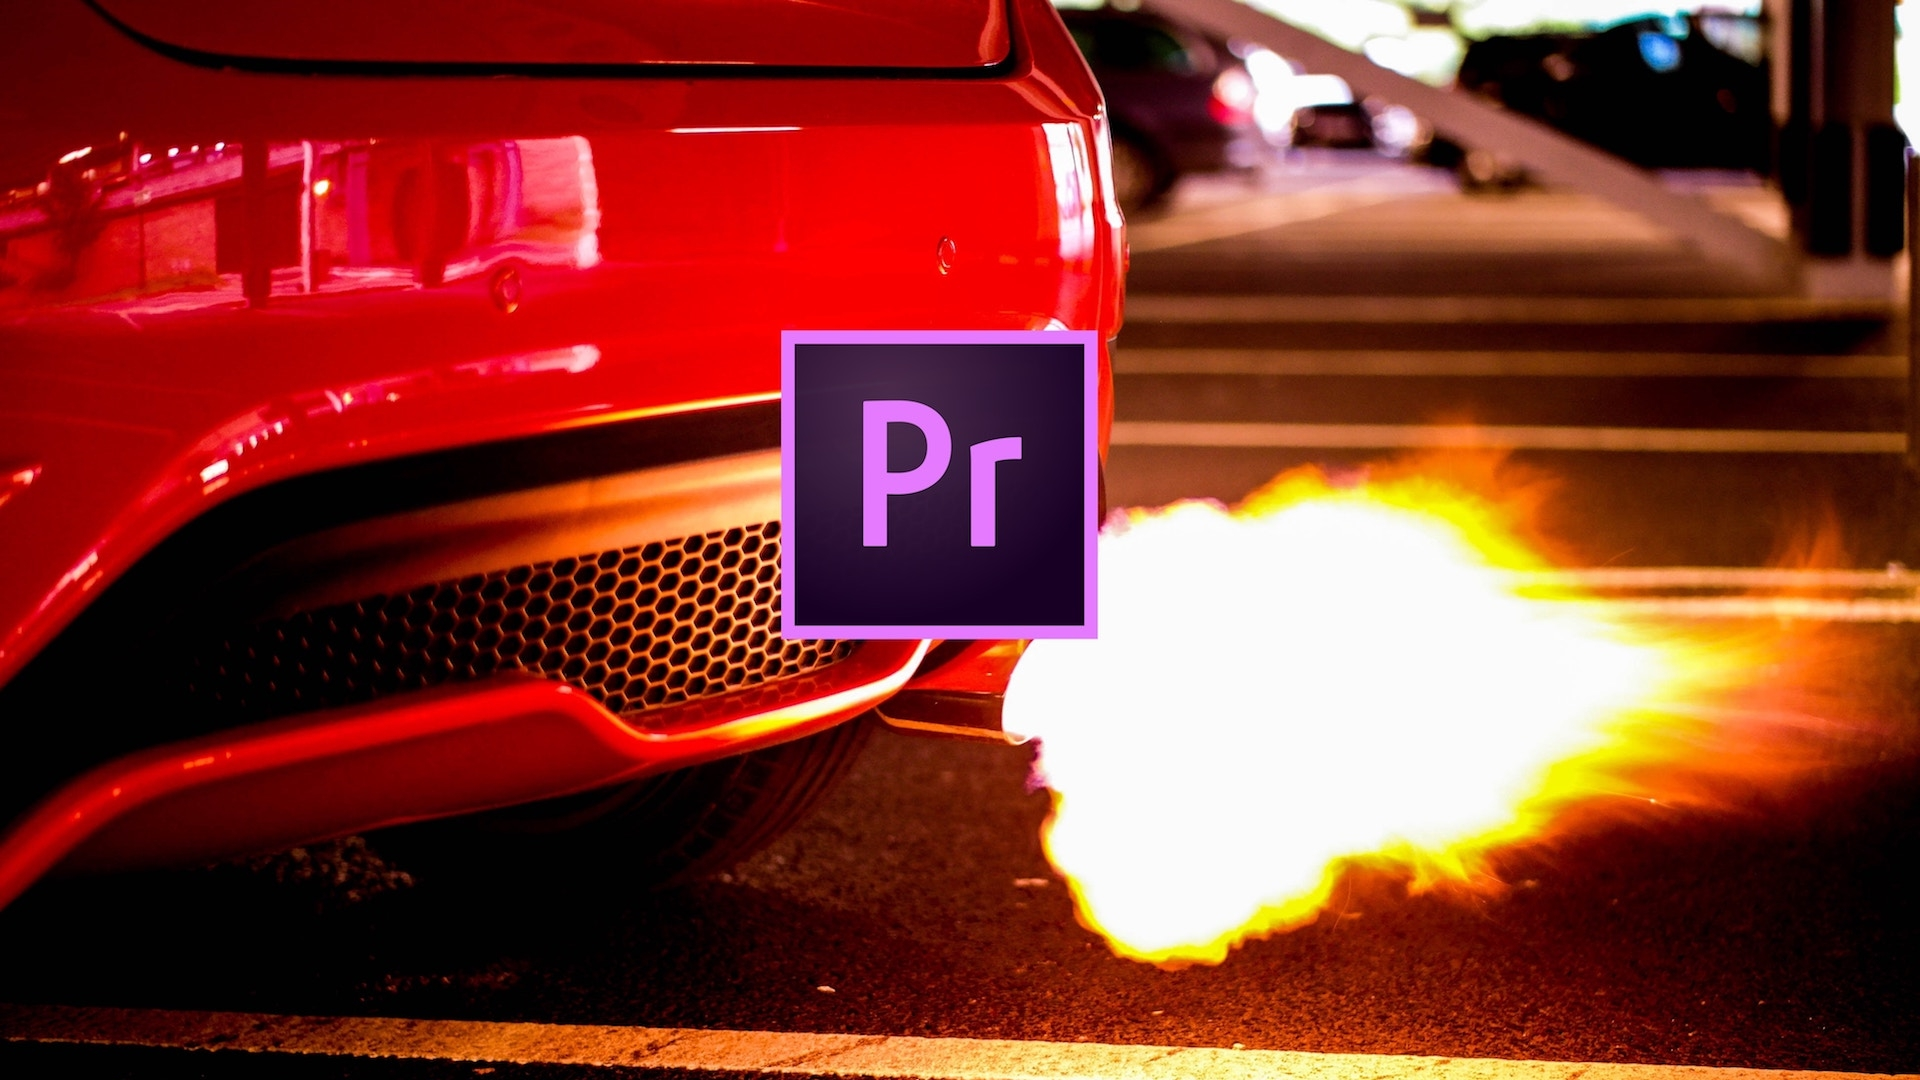 3-ways-optimize-performance-premiere-pro.jpg